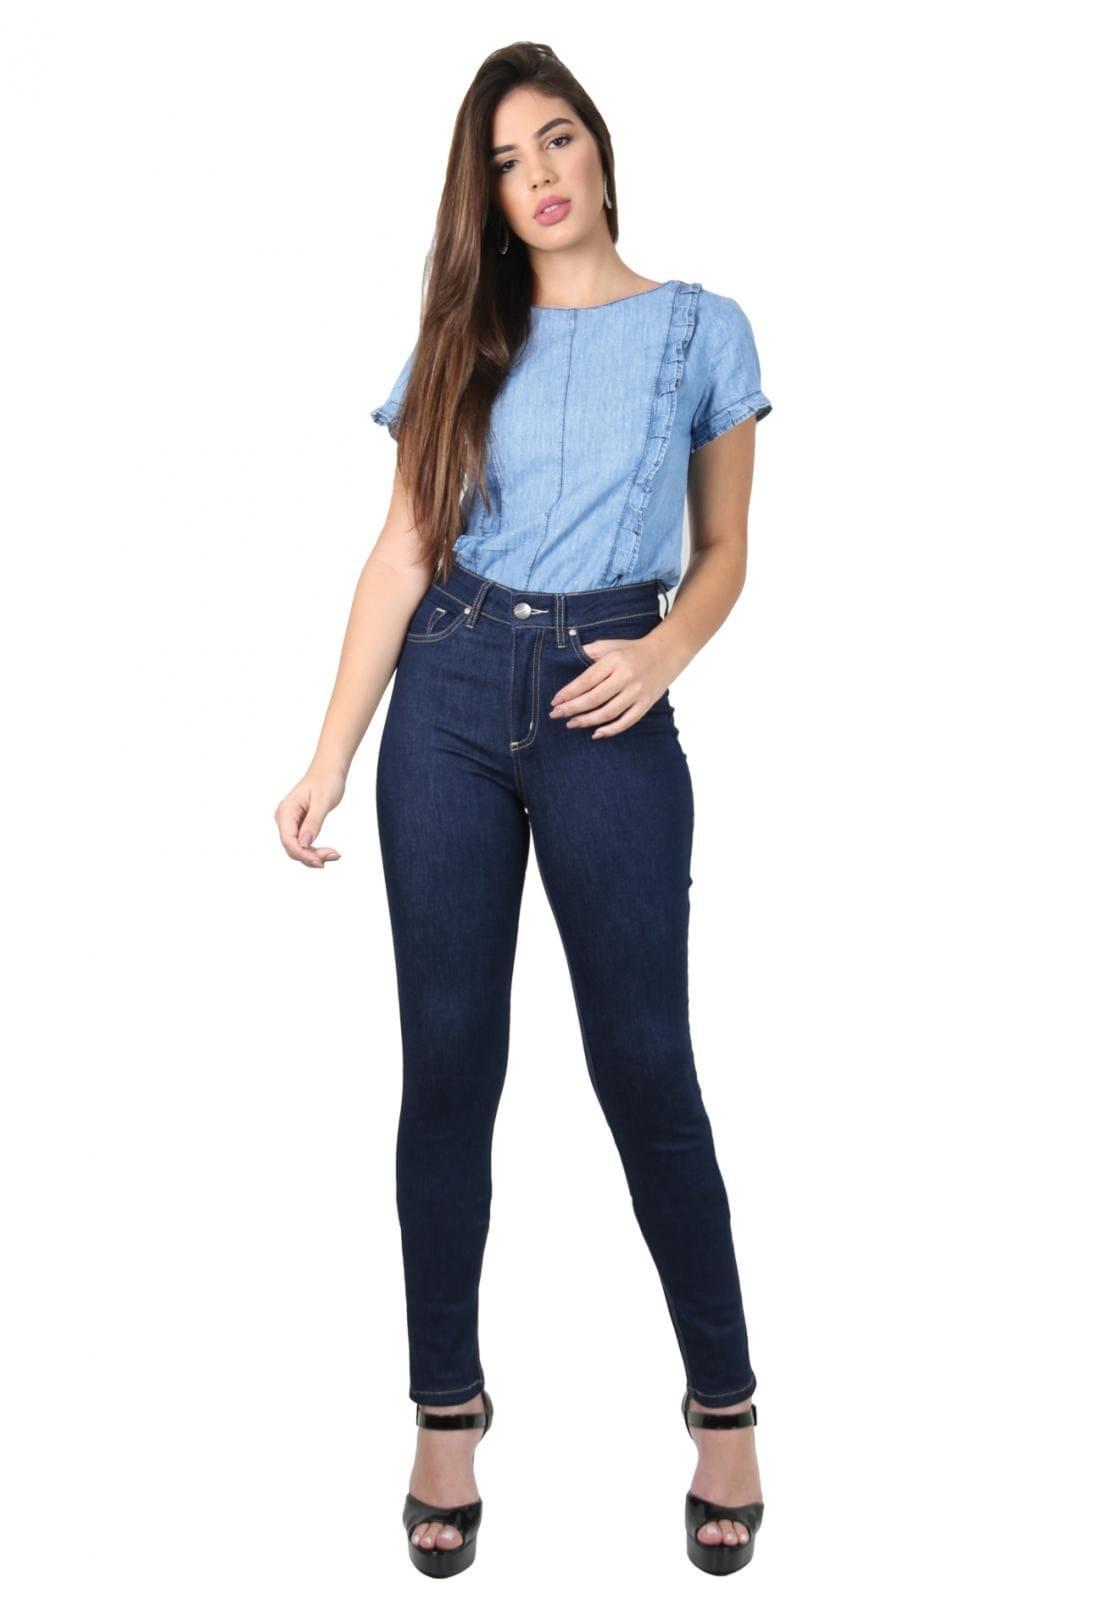 Calça Feminina Tradicional Alta Jeans Skinny